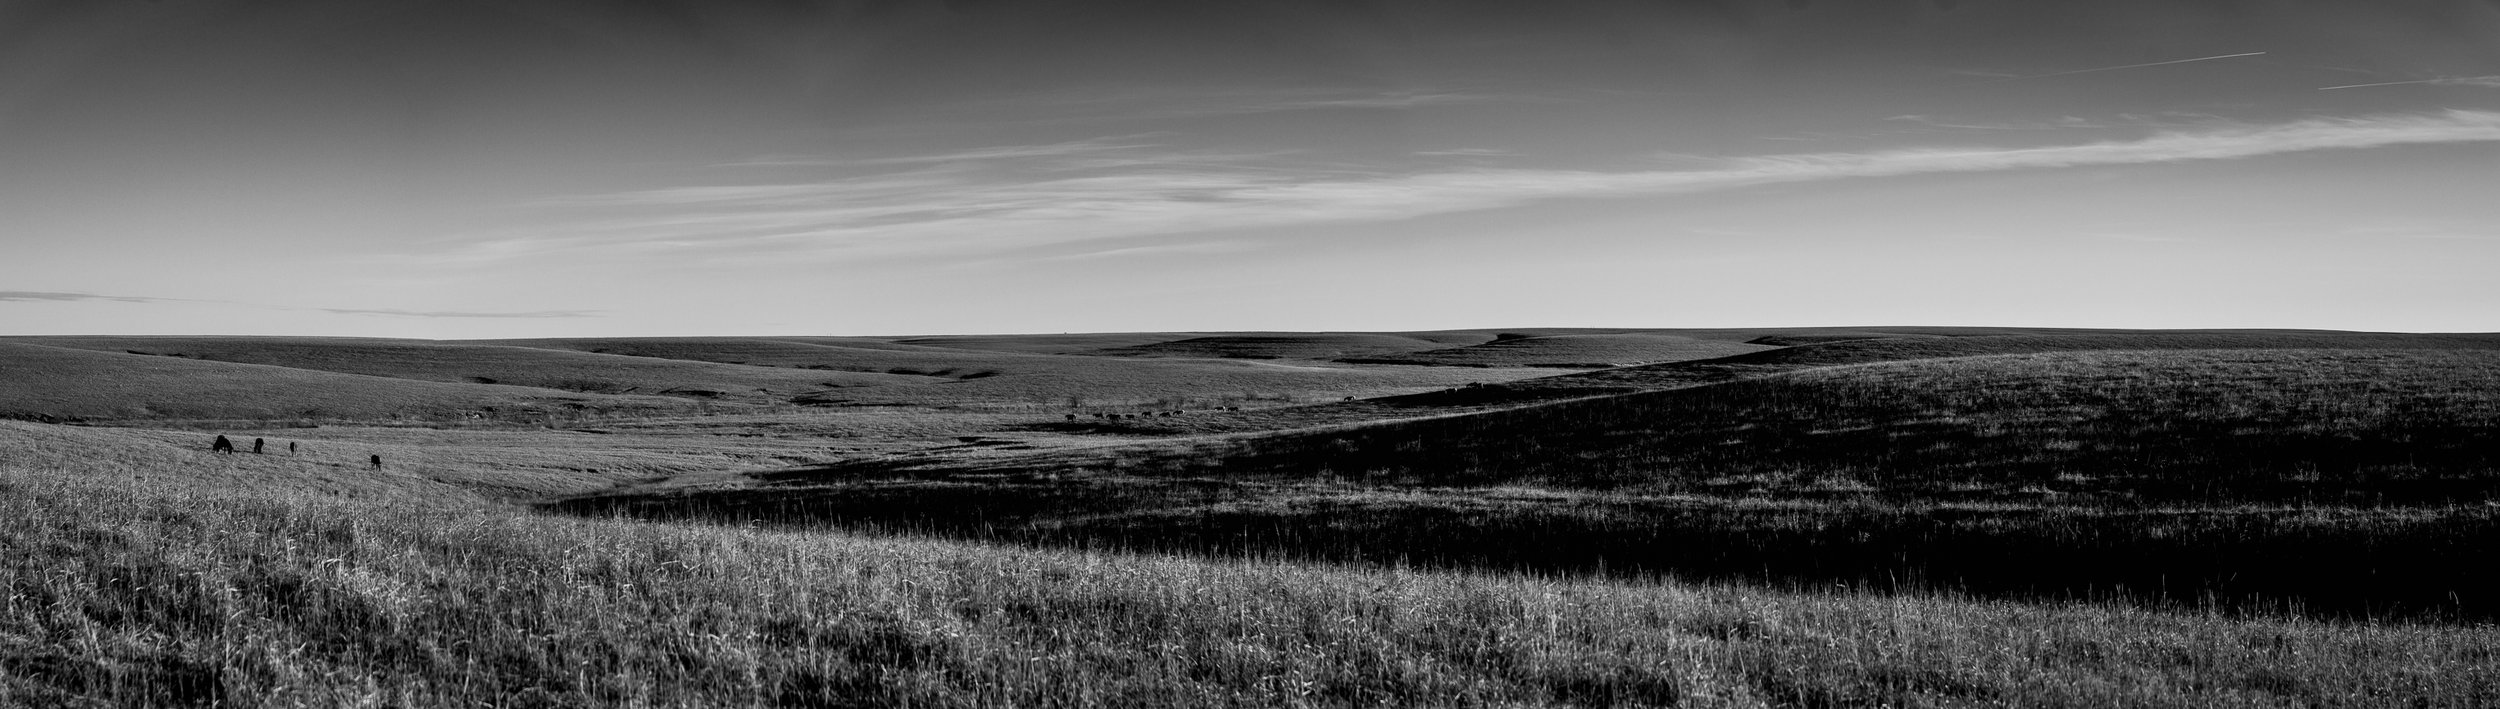 Panorama Sunset & Shadows with Wild Mustangs